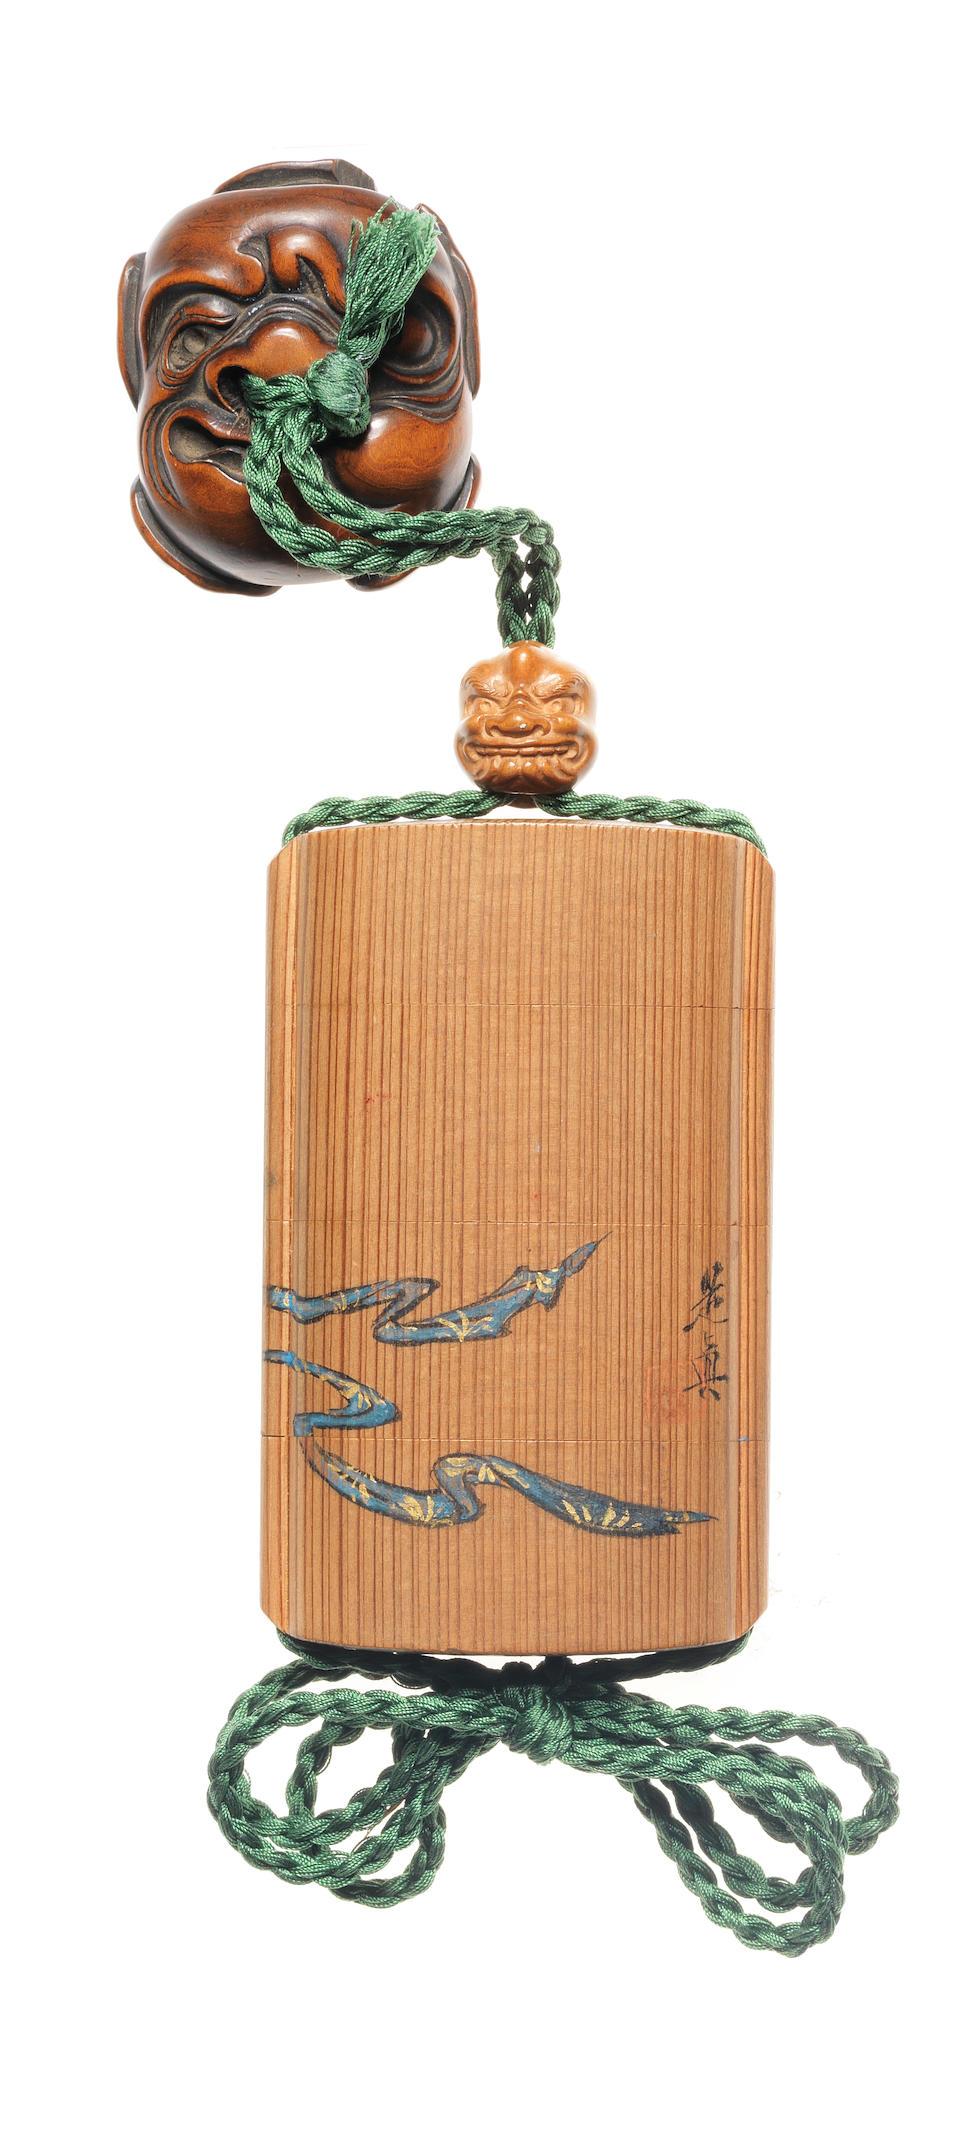 Shibata Zeshin 柴田是真 (1807–1891)  INRŌ WITH THE ONI-YARAI RITE  鬼遣図木地蒔絵印籠 Meiji era (1868–1912), circa 1870–1890